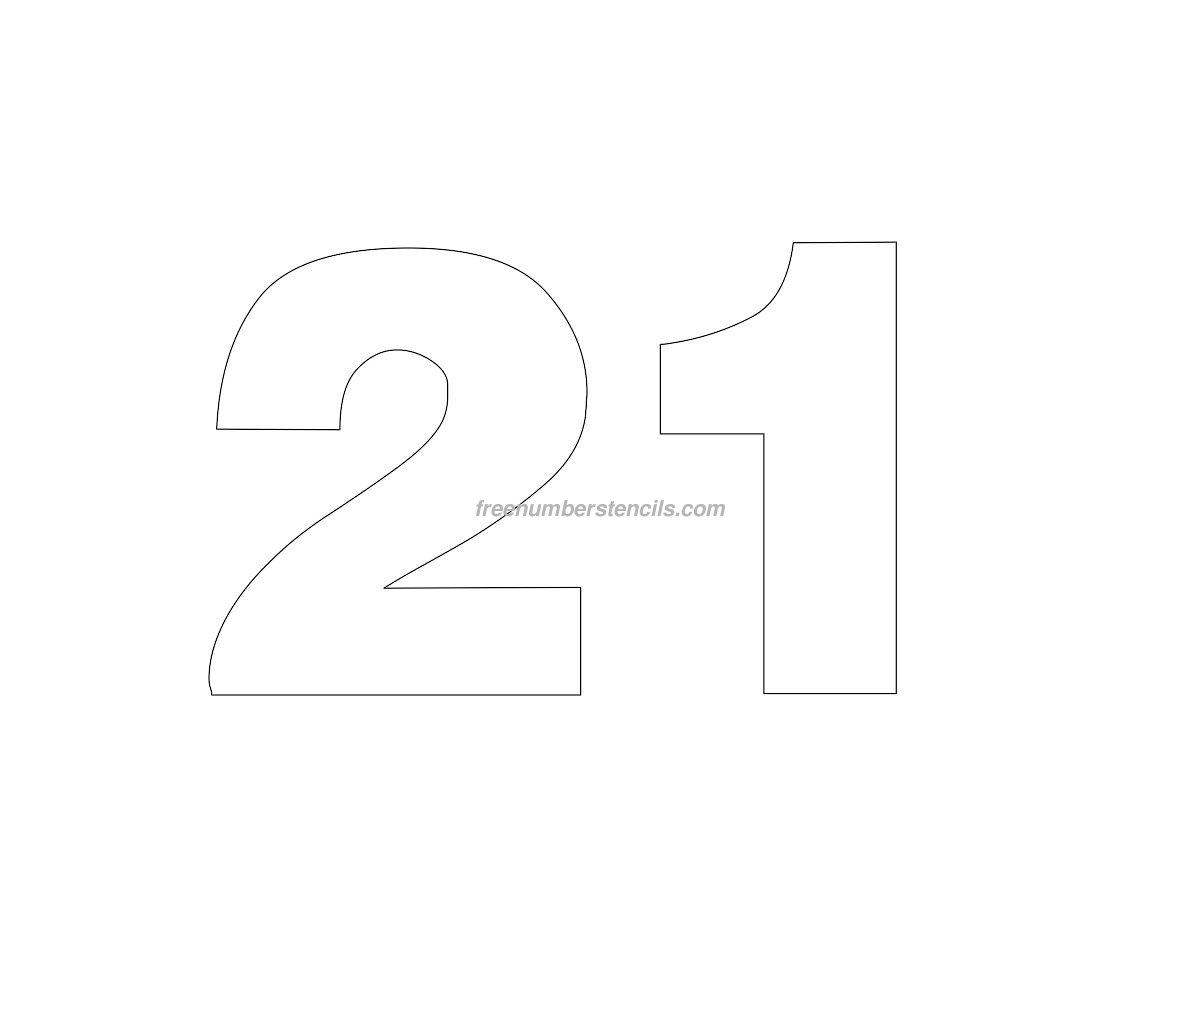 Free Helvetica 21 Number Stencil Freenumberstencils Com